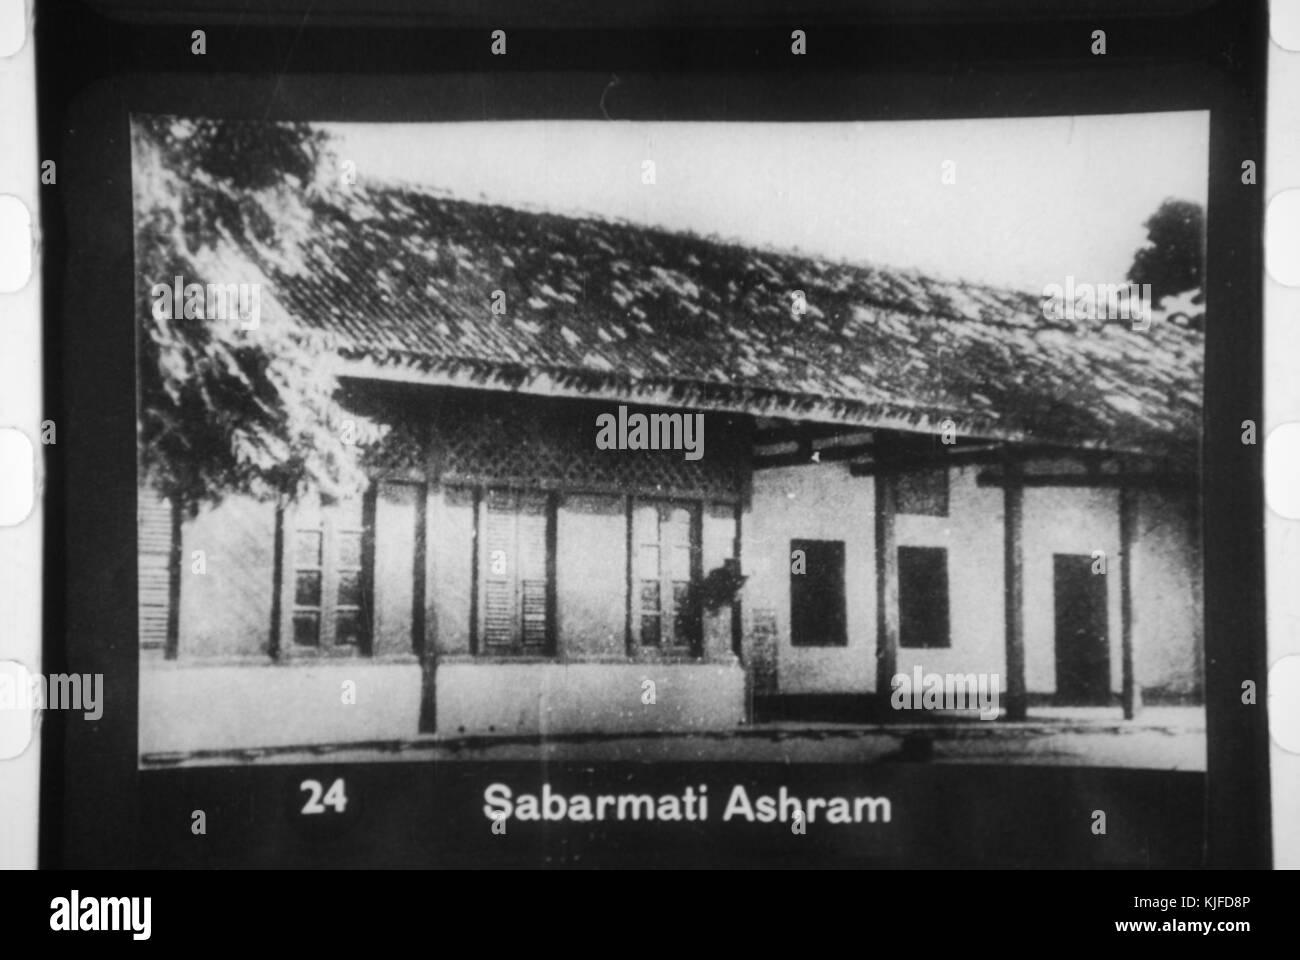 Sabarmati Ashram Ahmedabad - Stock Image